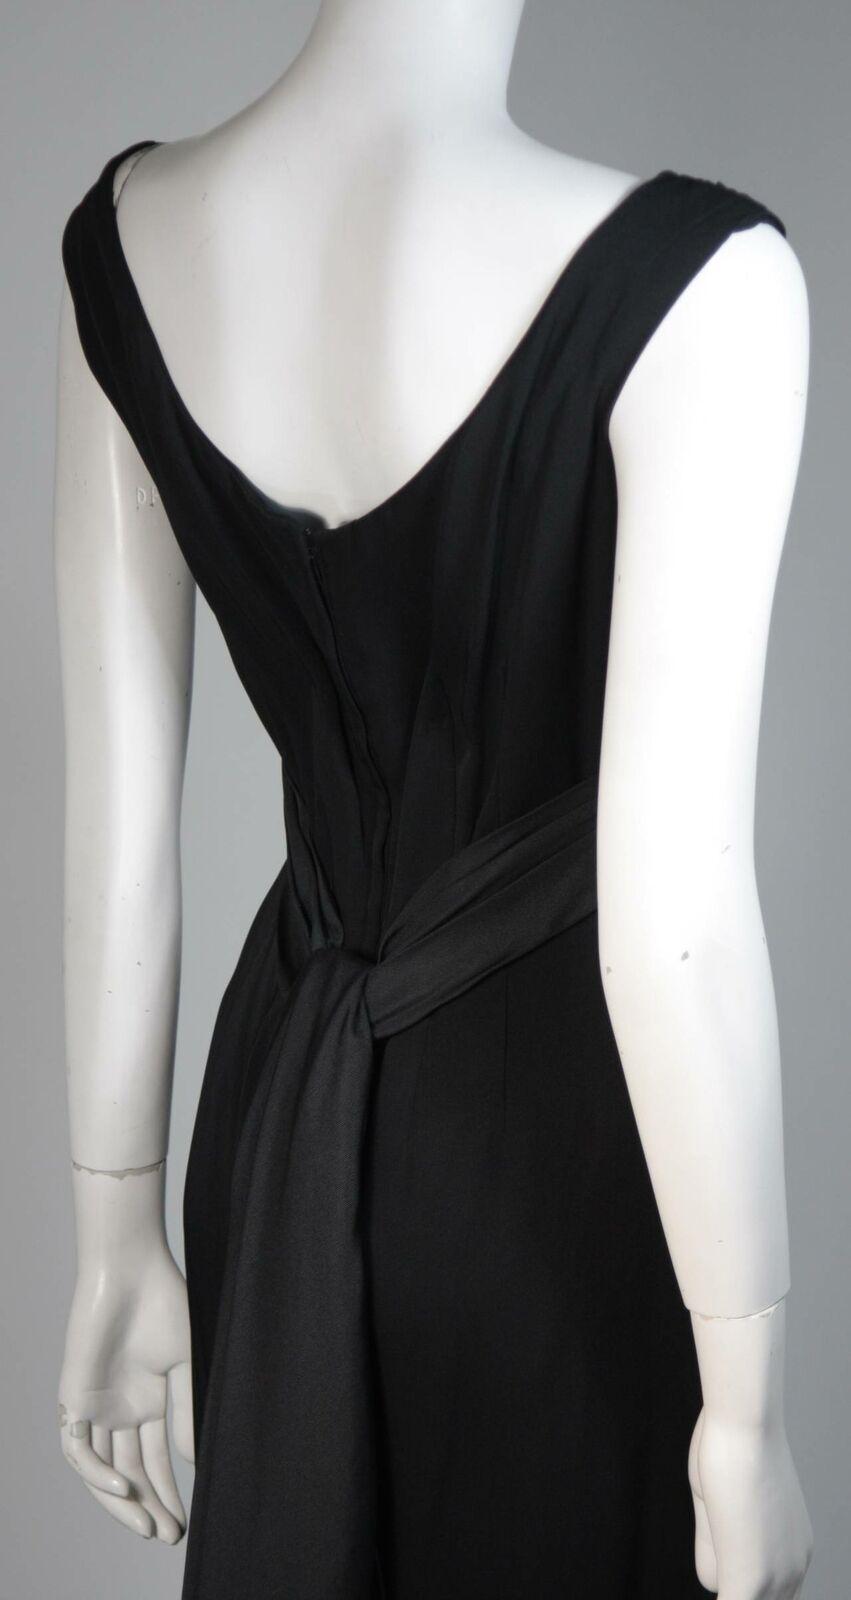 CEIL CHAPMAN 1950s Black Draped Cocktail Dress Si… - image 8